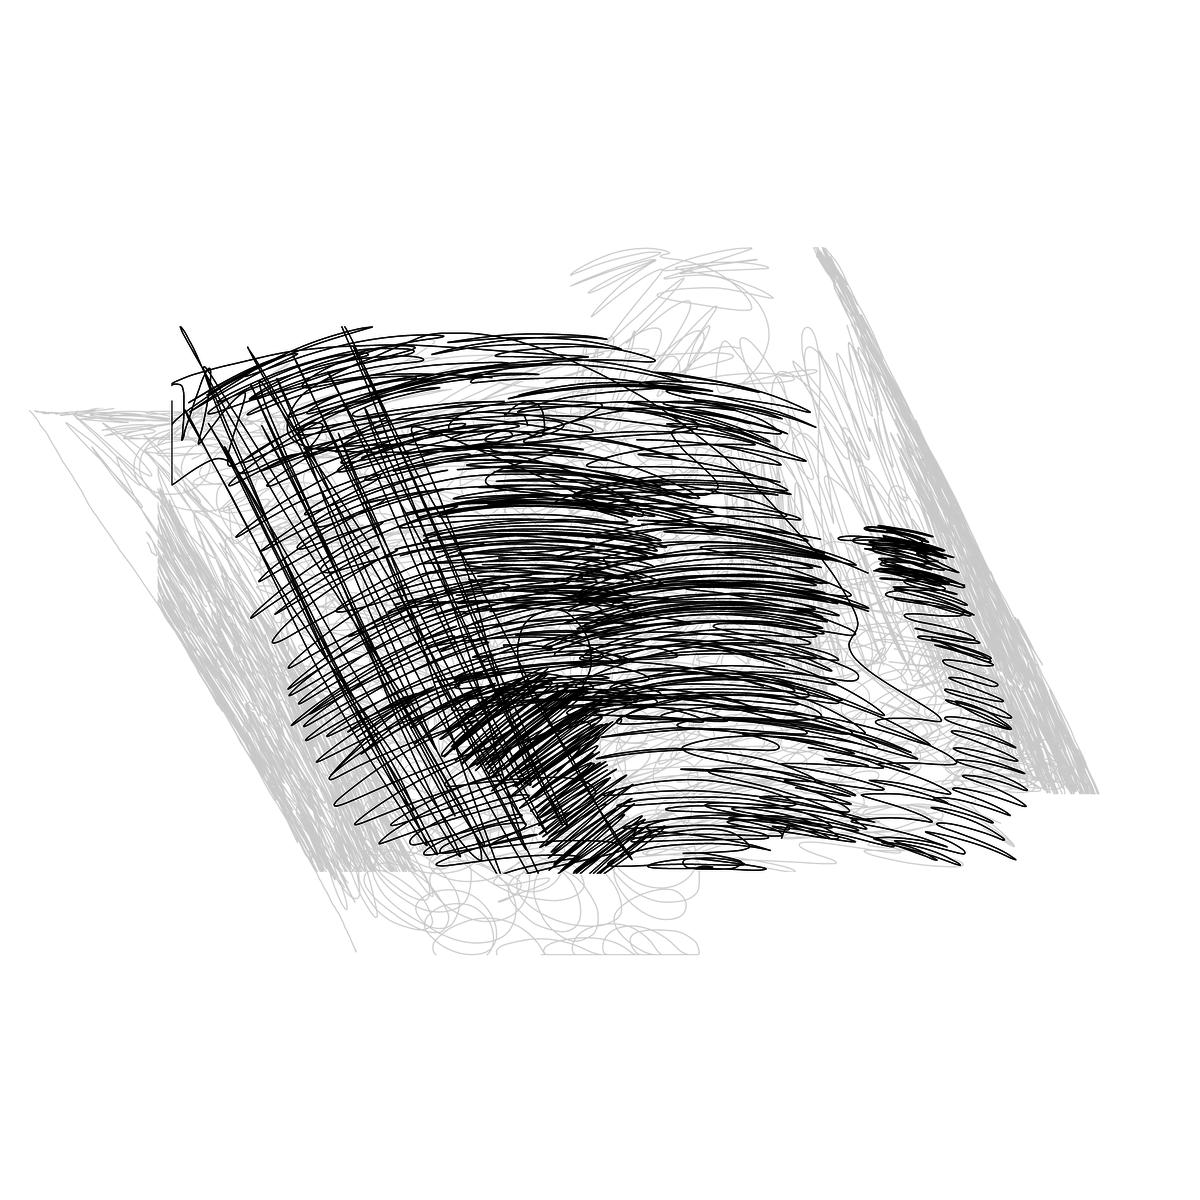 BAAAM drawing#6167 lat:52.4879684448242200lng: 13.4253435134887700